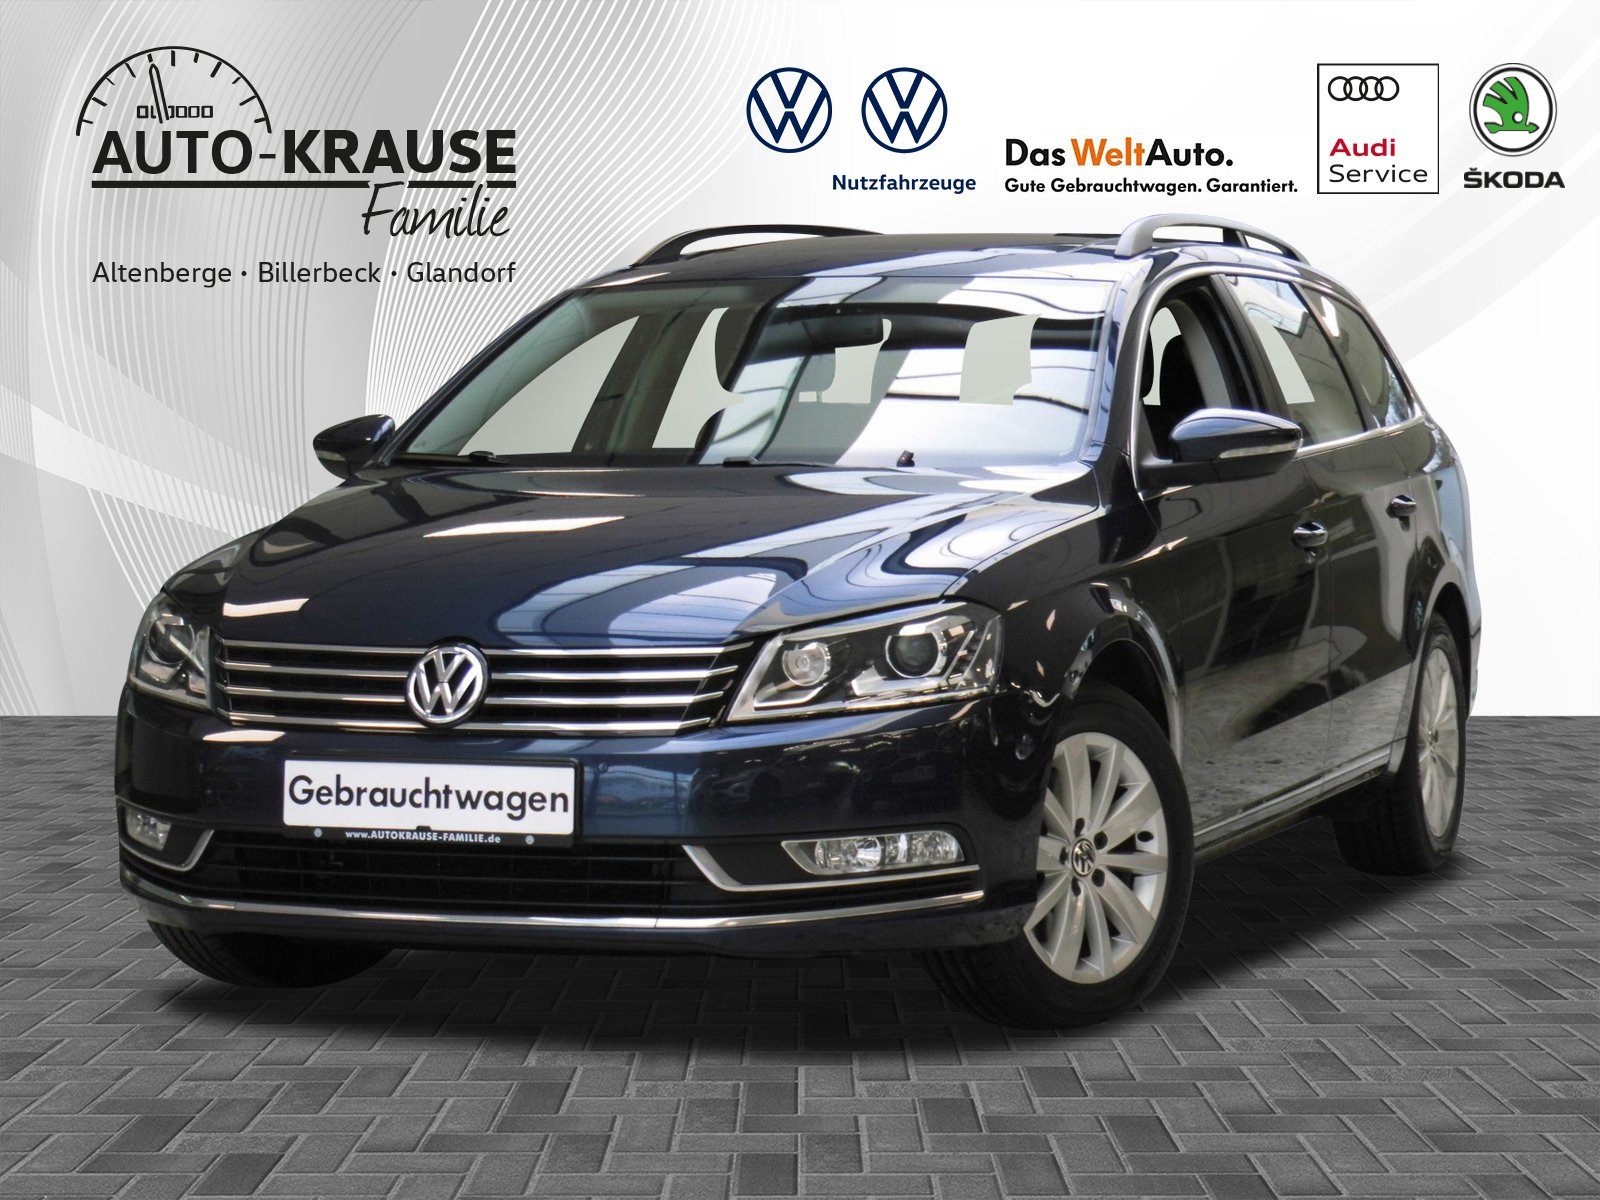 Volkswagen Passat 2.0 TDI BMT Comfortline, Jahr 2013, Diesel